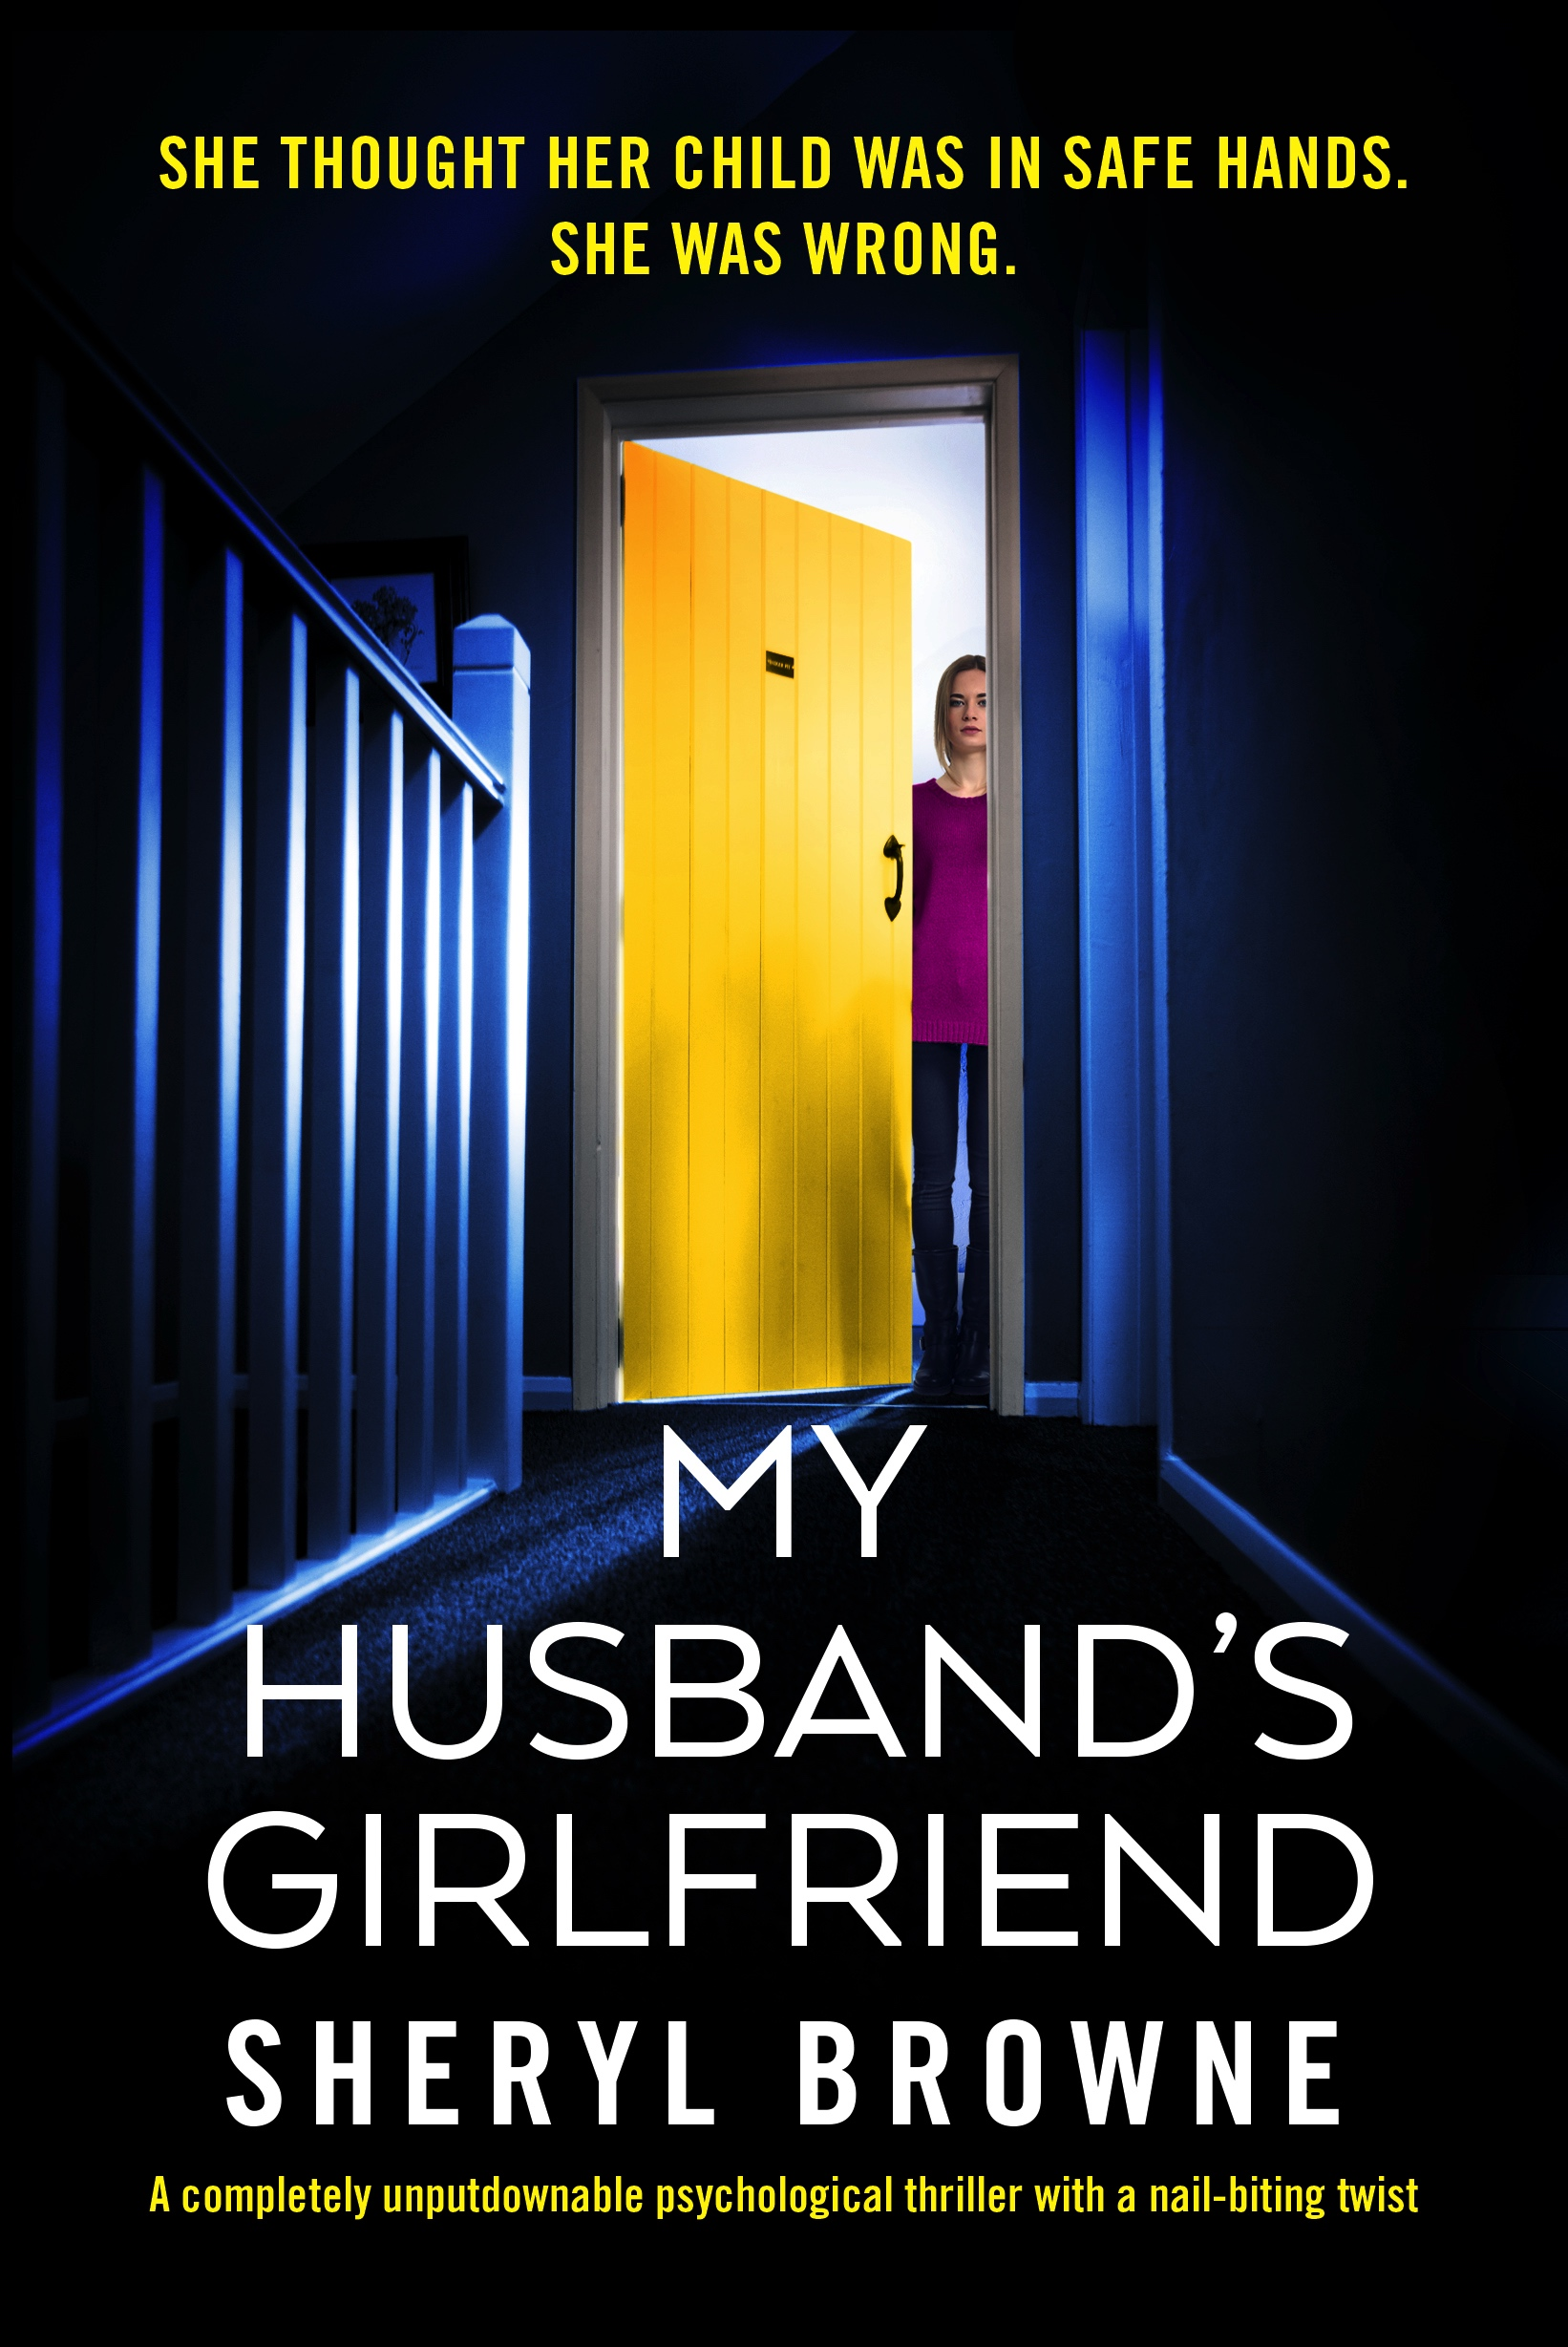 Damaged people are dangerous – My Husband's Girlfriend